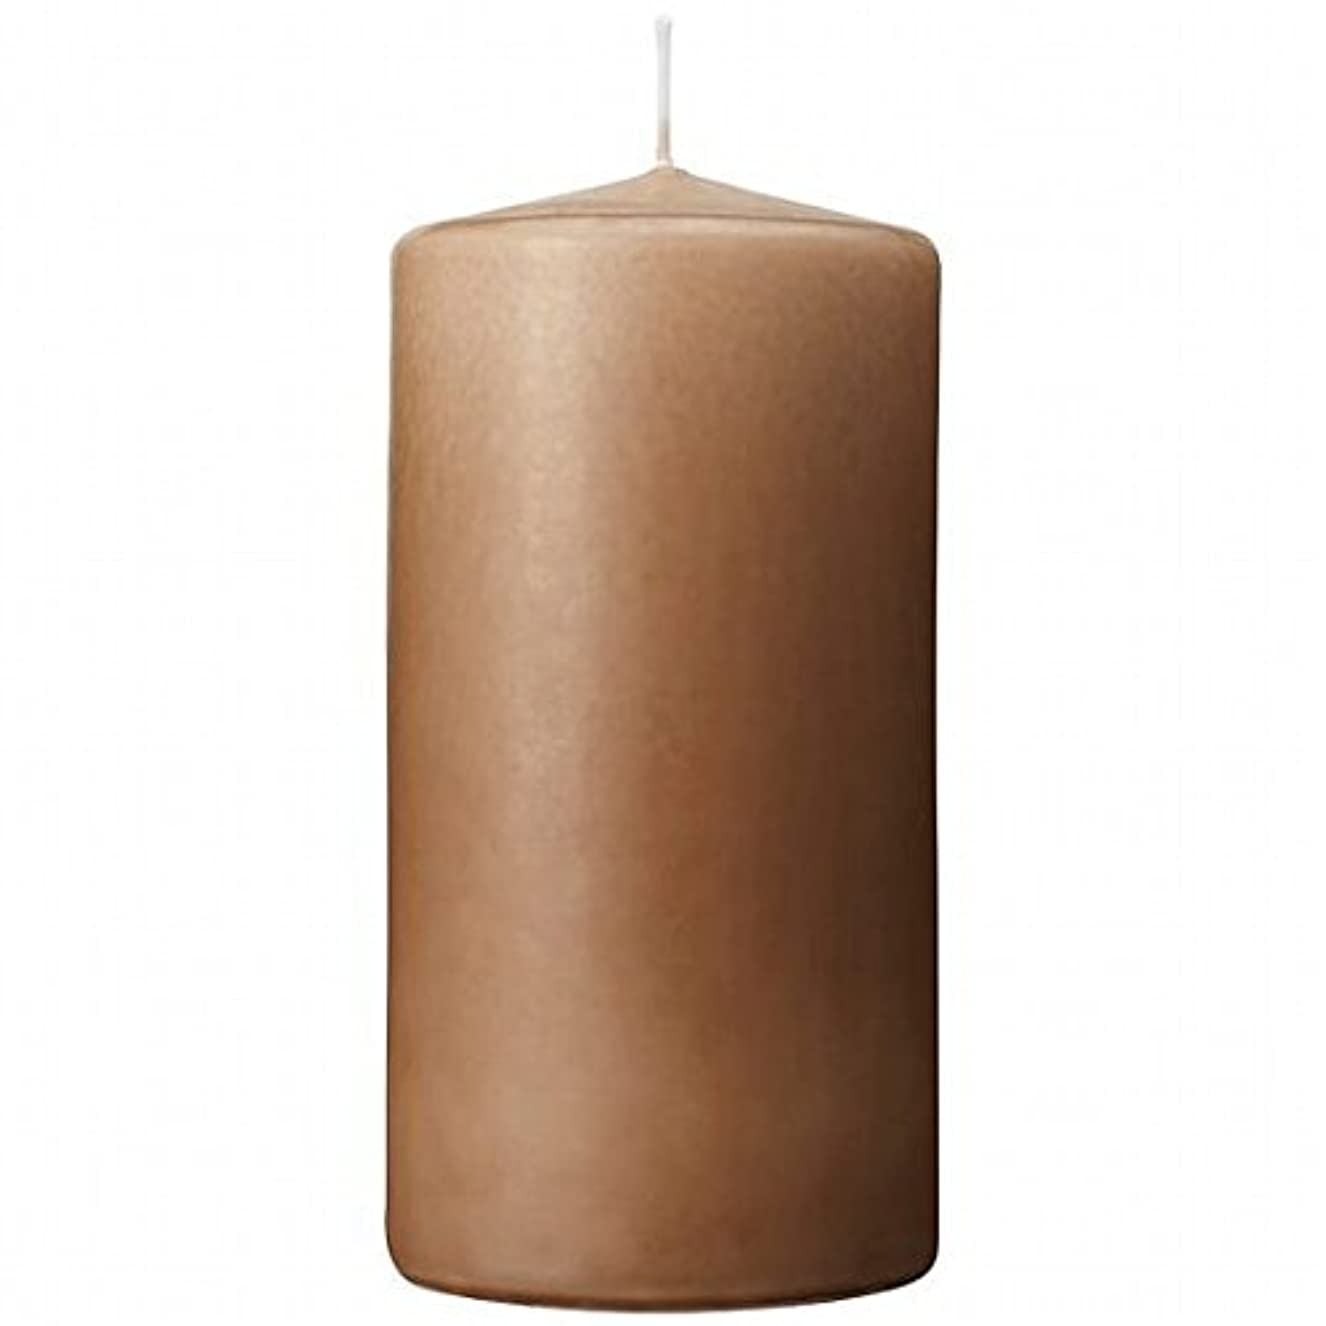 kameyama candle(カメヤマキャンドル) 3×6ベルトップピラーキャンドル 「 モカ 」(A9730010MO)